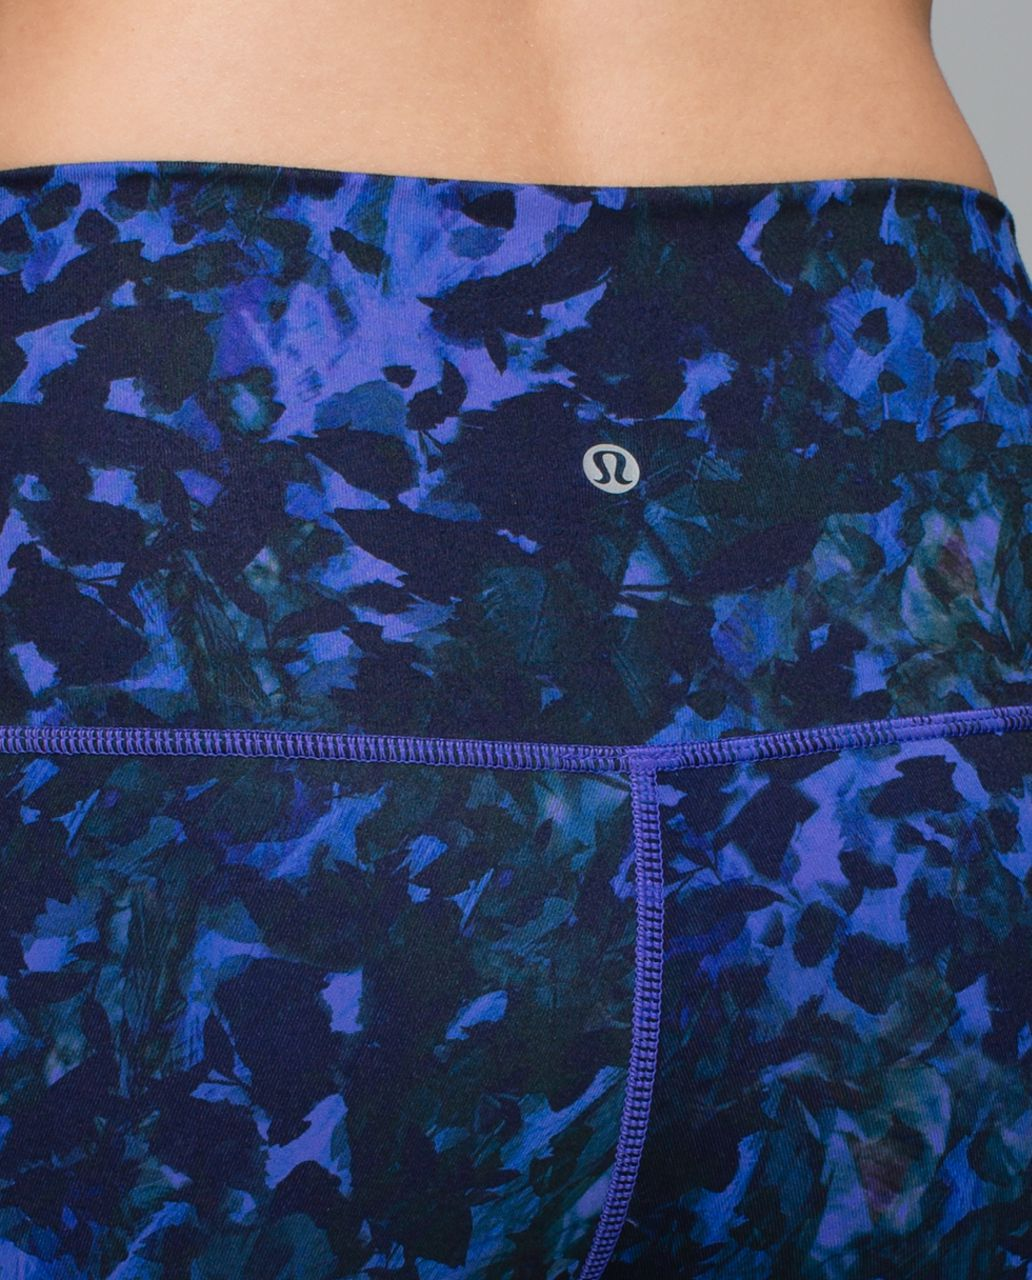 Lululemon Wunder Under Pant *Full-On Luon (Roll Down) - Floral Sport Backdrop Iris Flower Multi